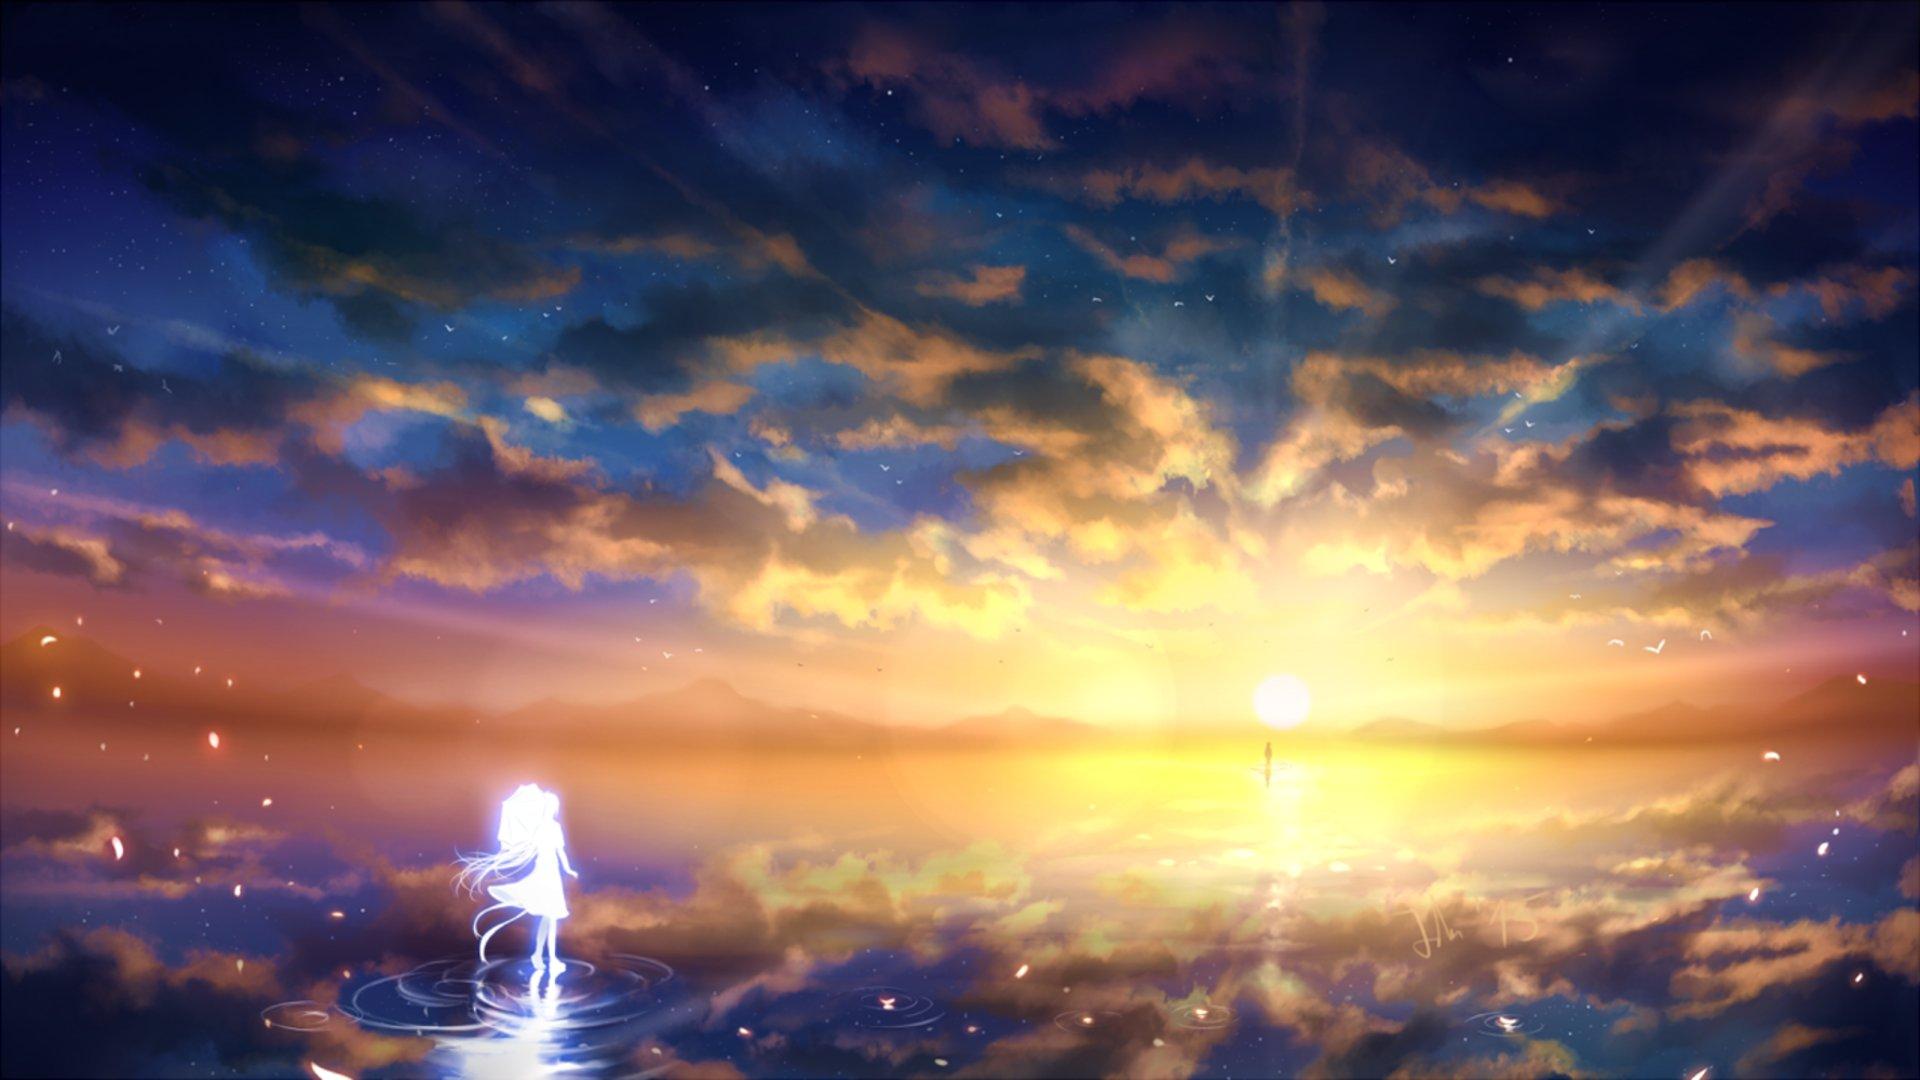 Sunset anime girl sky clouds wallpaper | 4578x2489 | 707221 ...